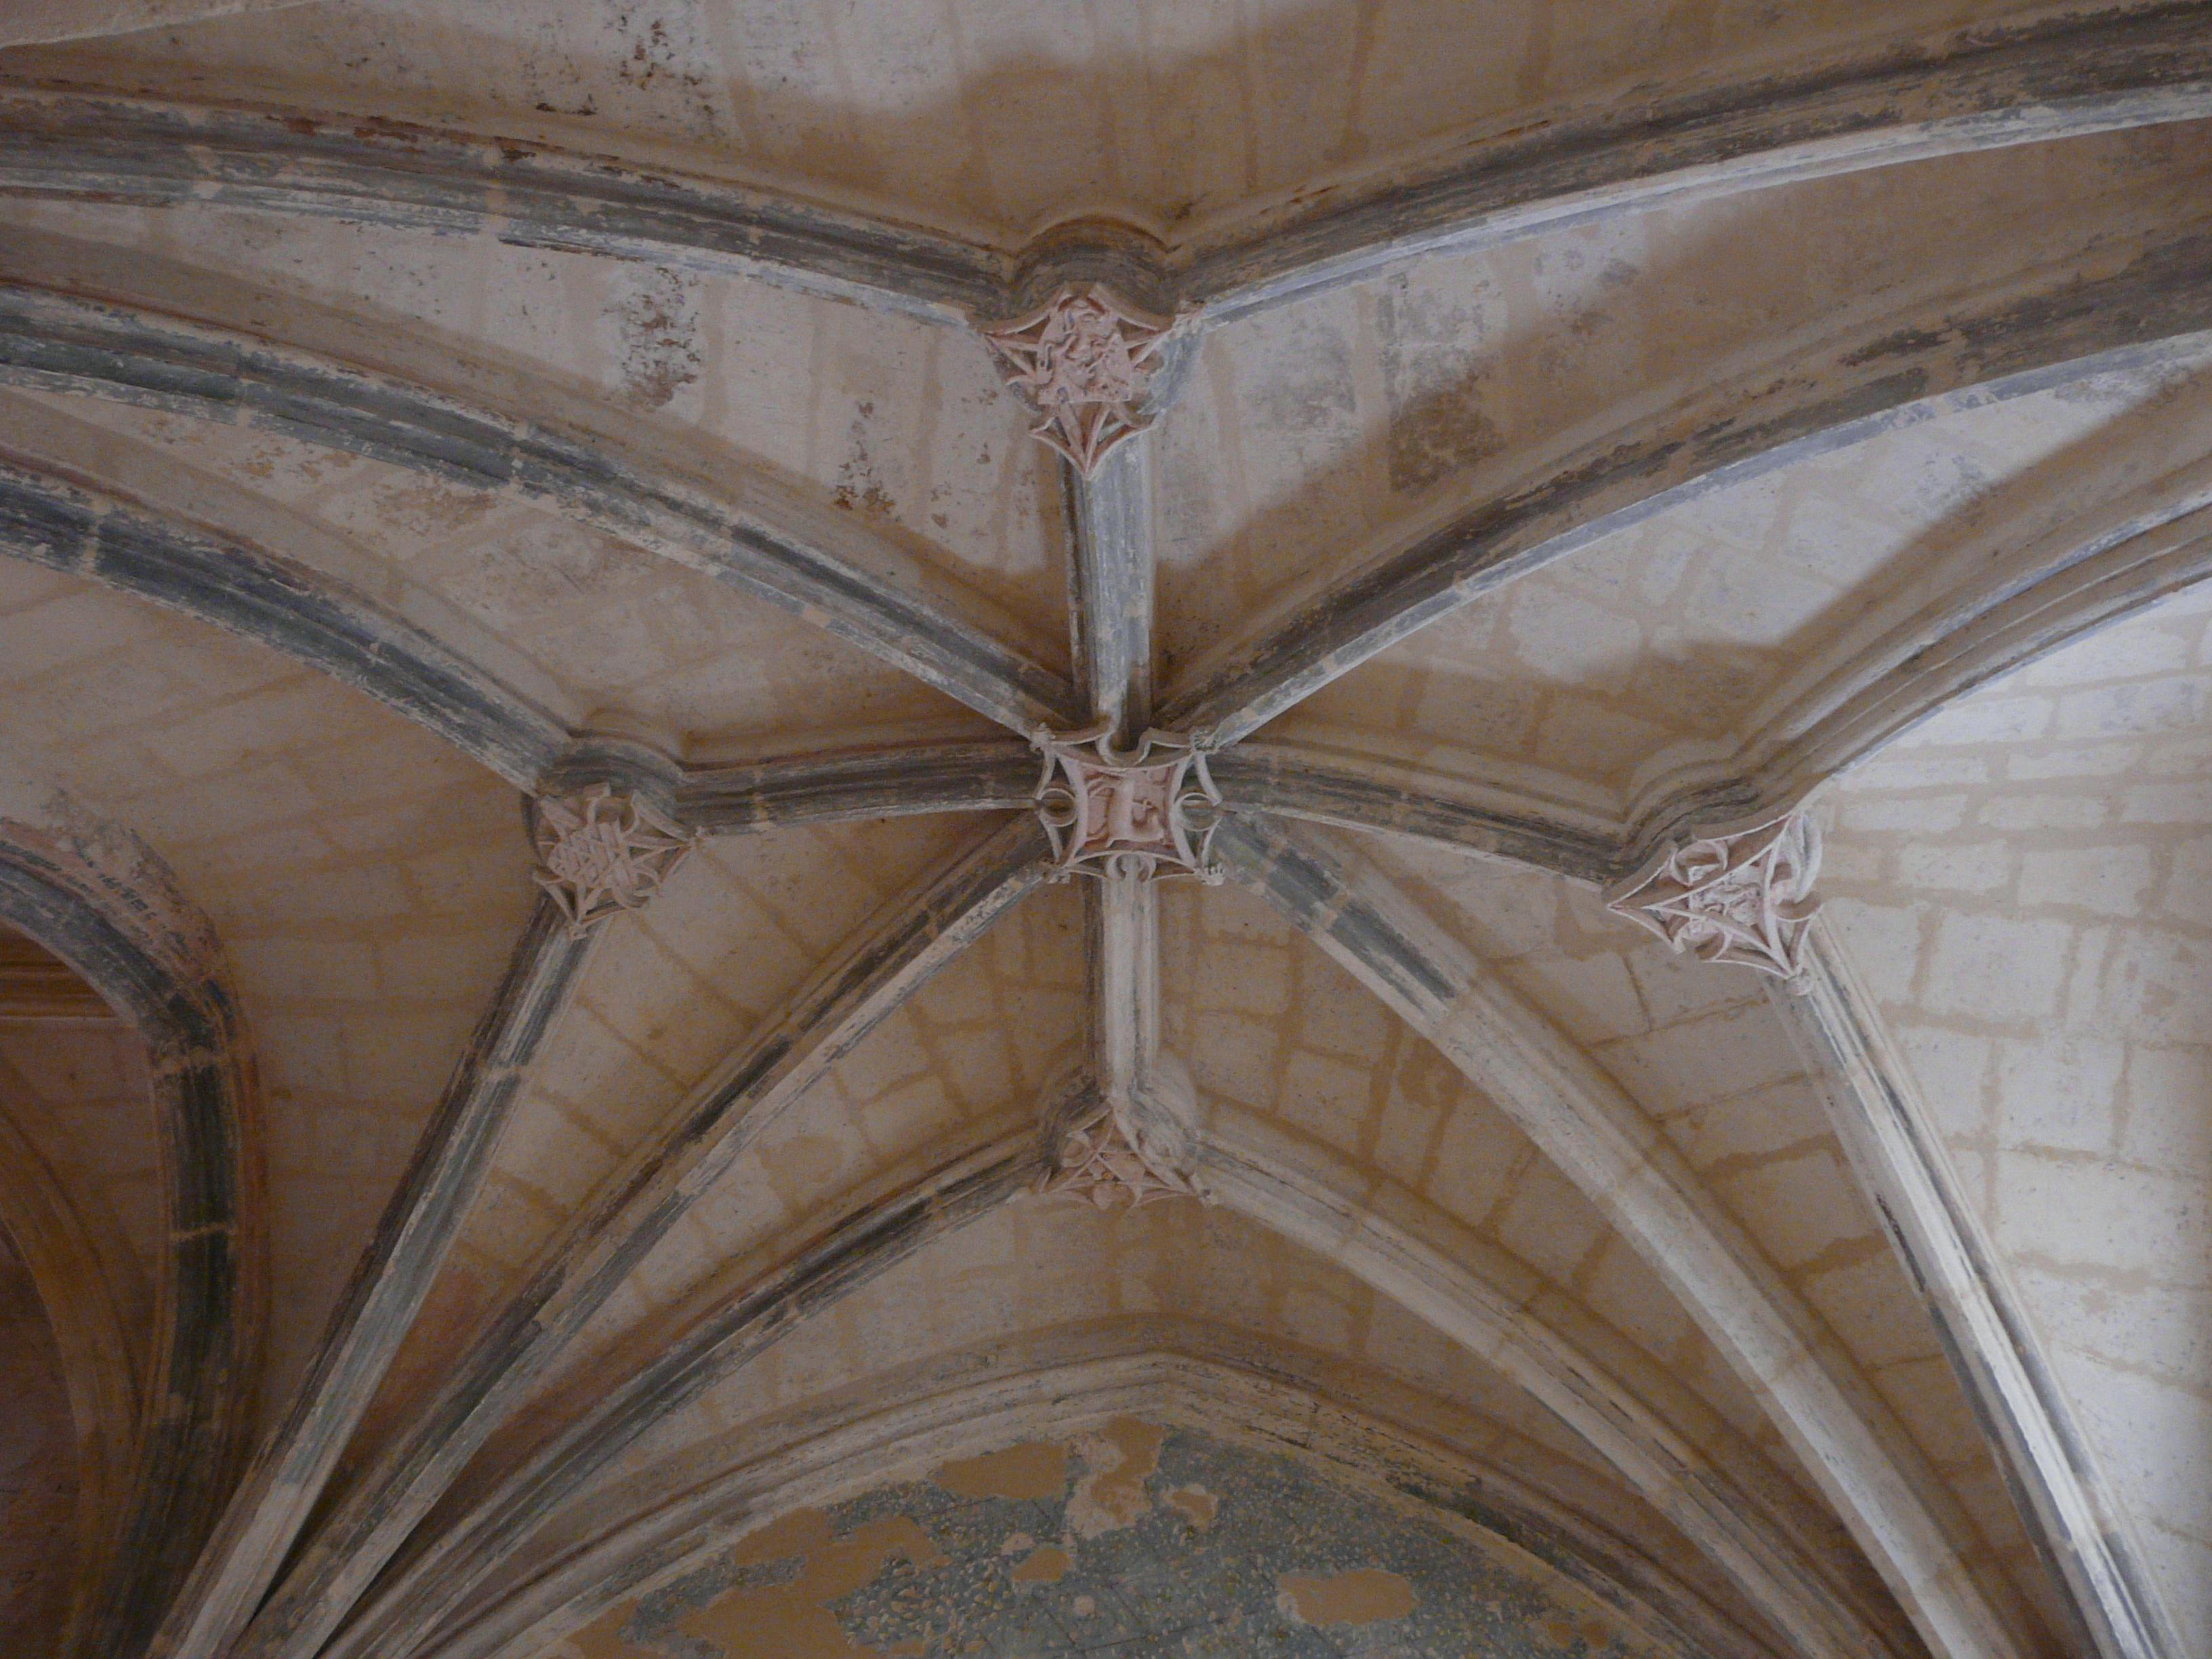 File sourzac glise plafond grande chapelle sud jpg - Plafond de la chapelle sixtine description ...